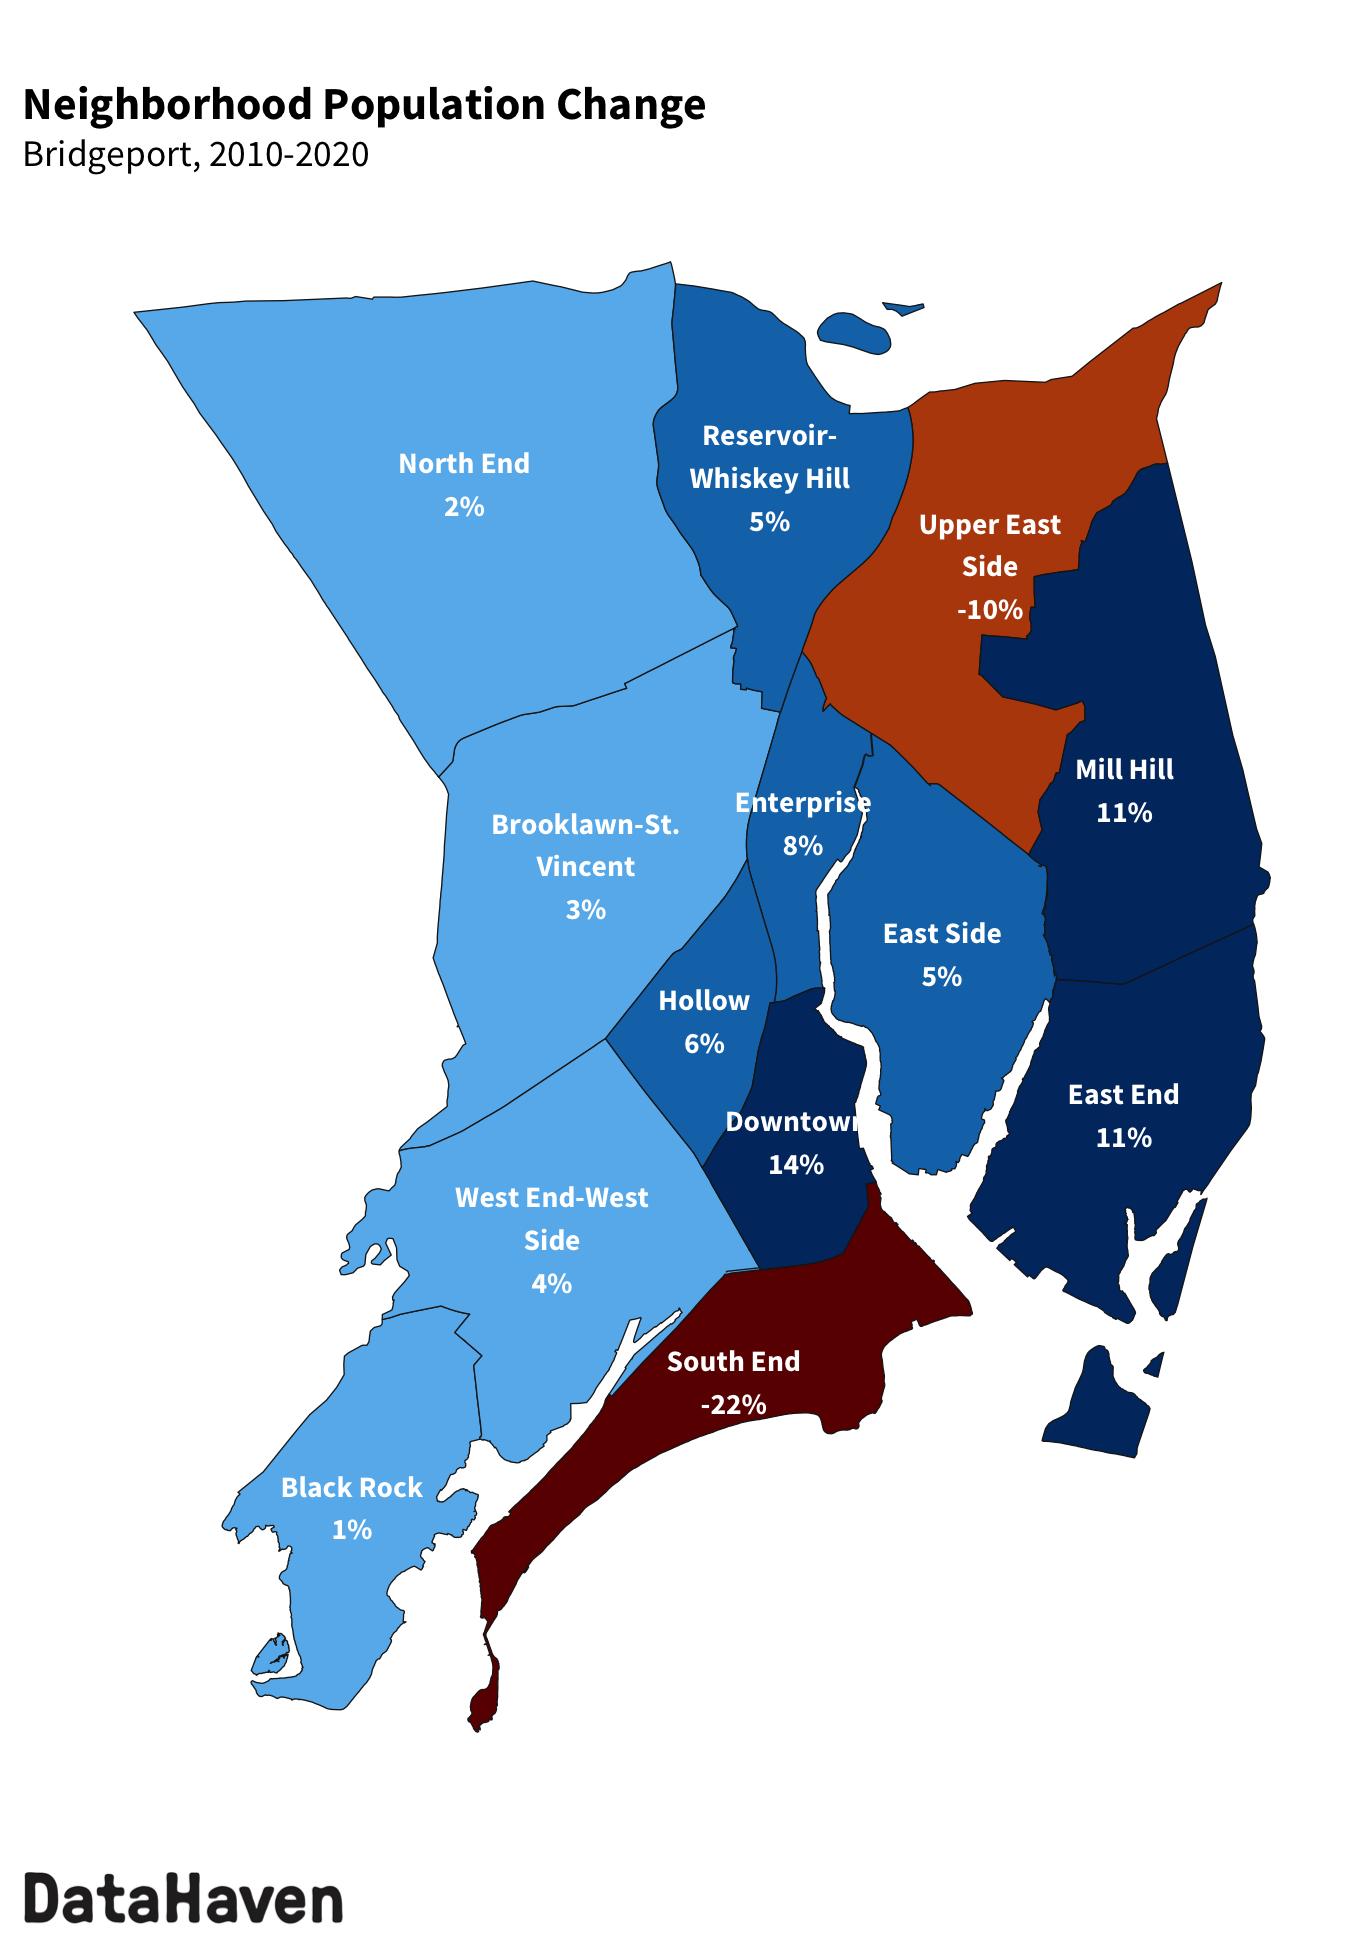 Bridgeport change in population from 2010 to 2020 Census